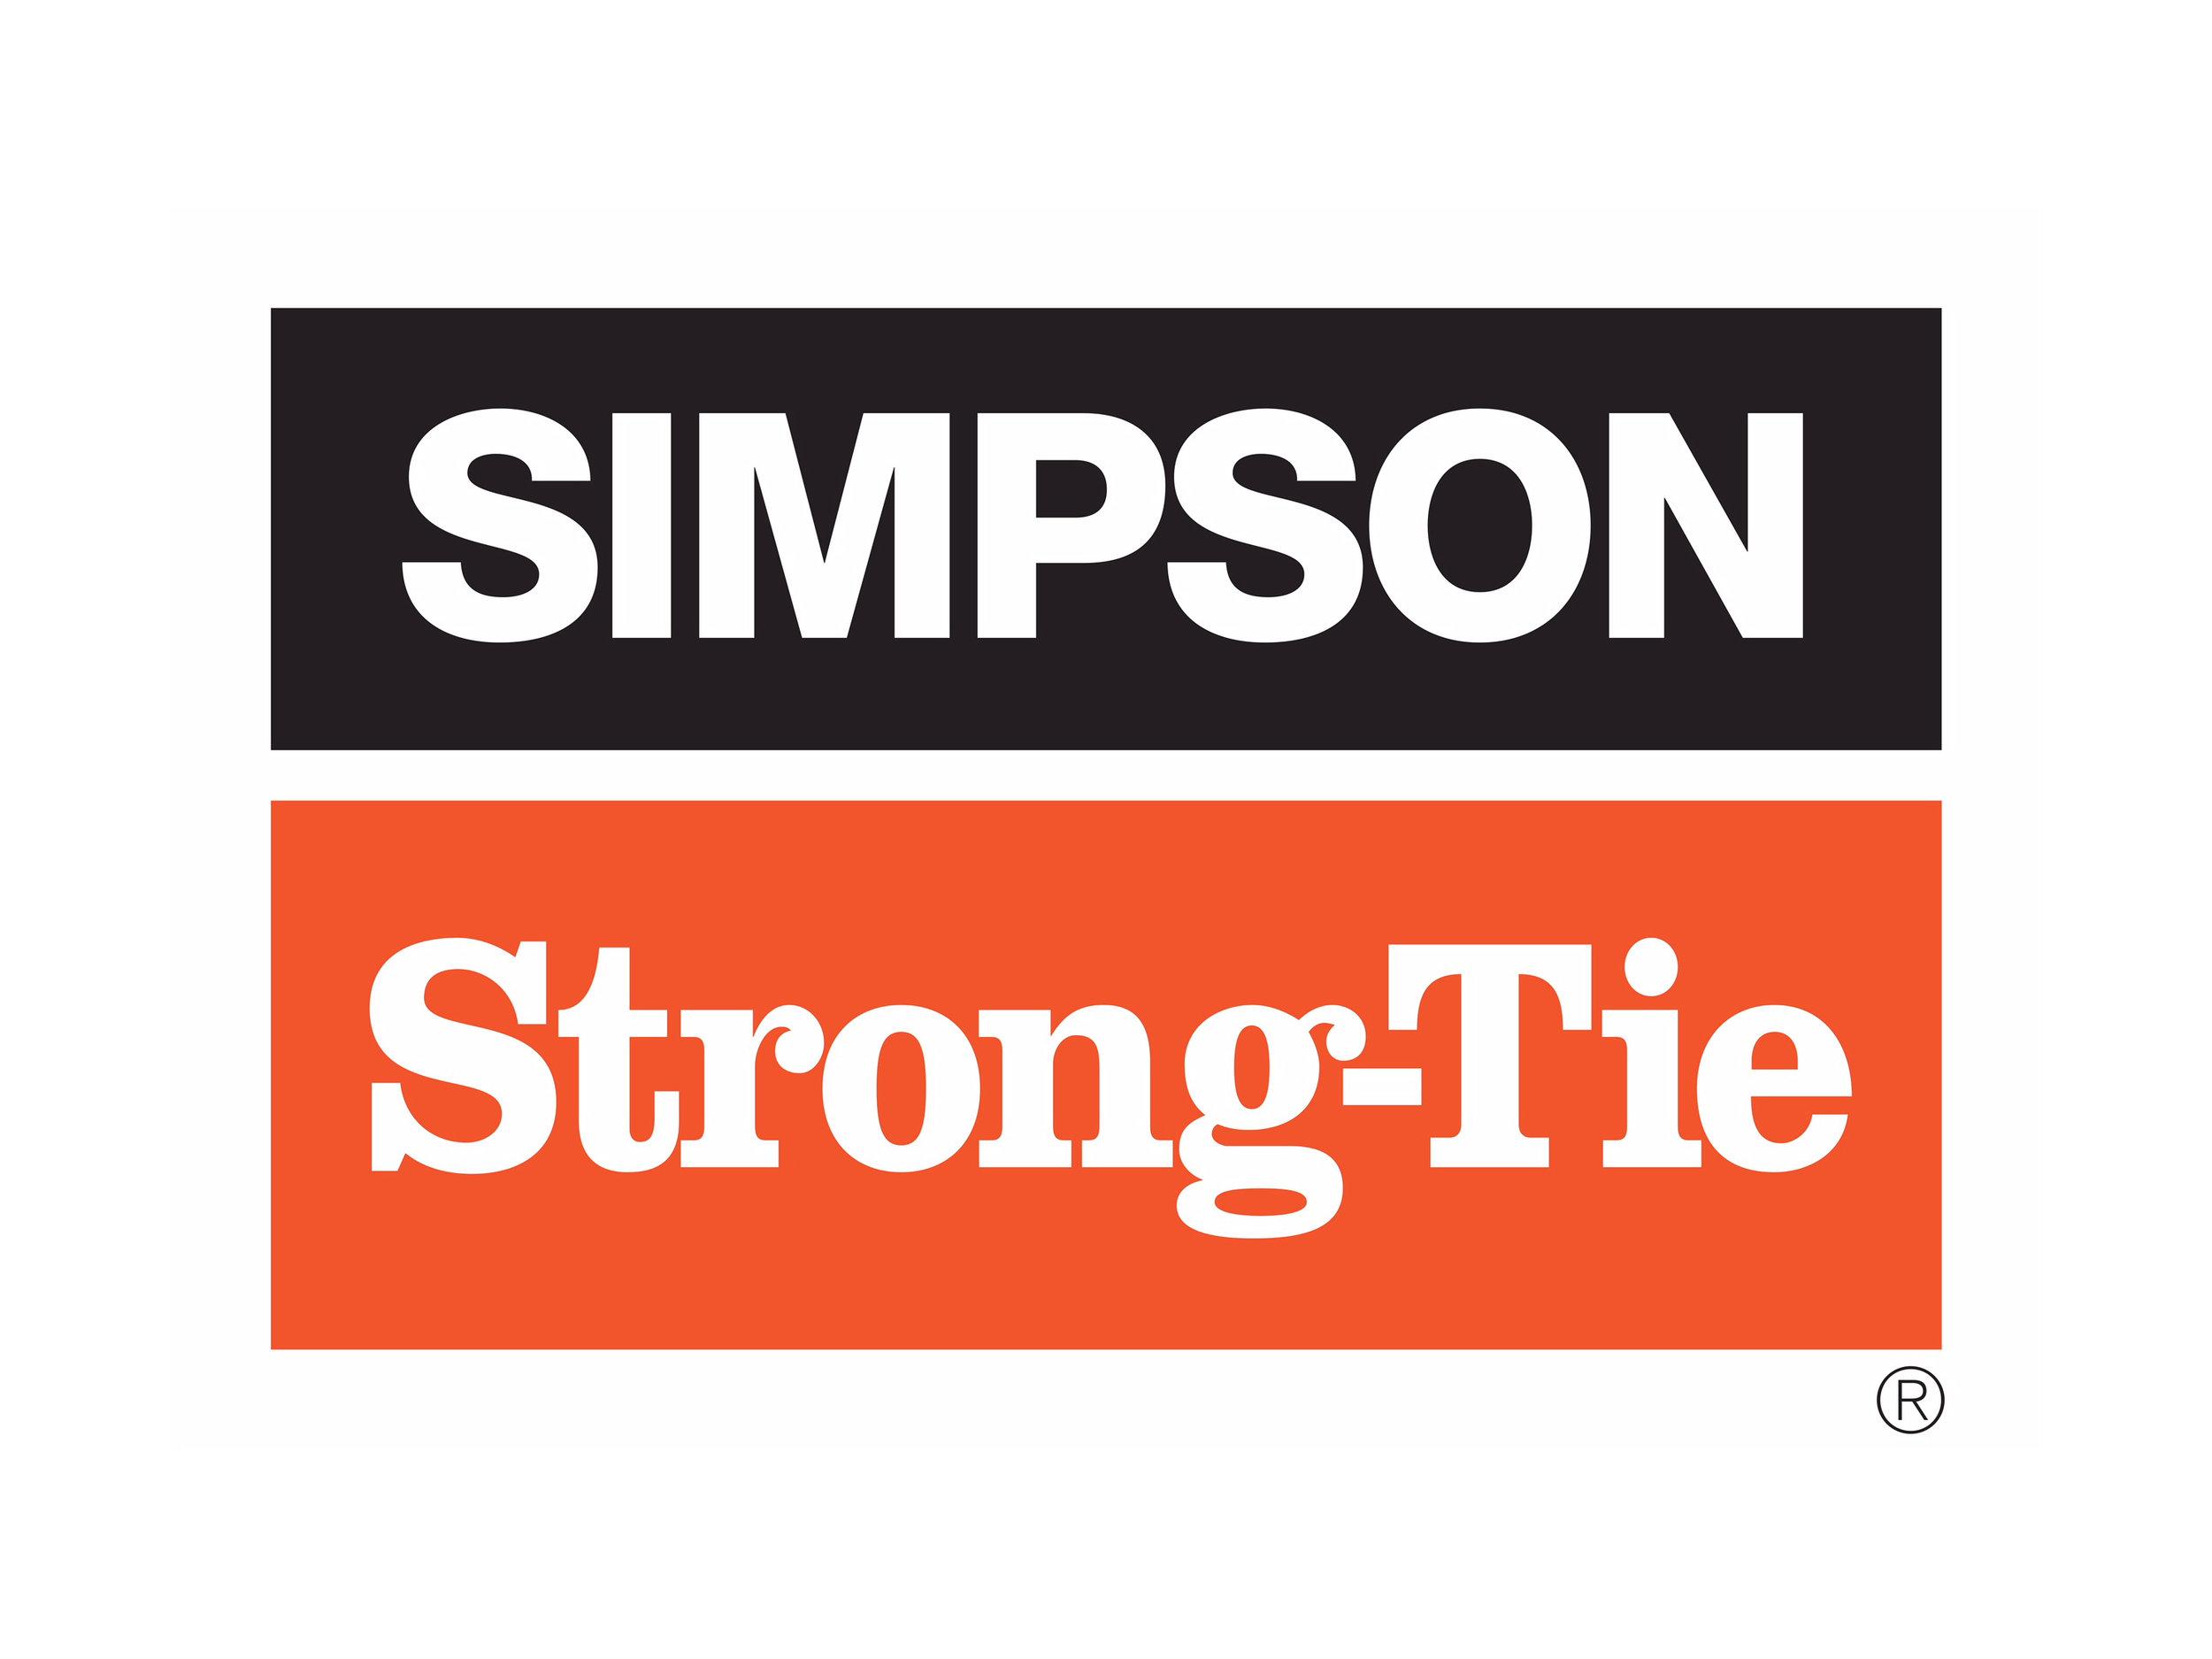 Simspon Strong Tie 2018.JPG